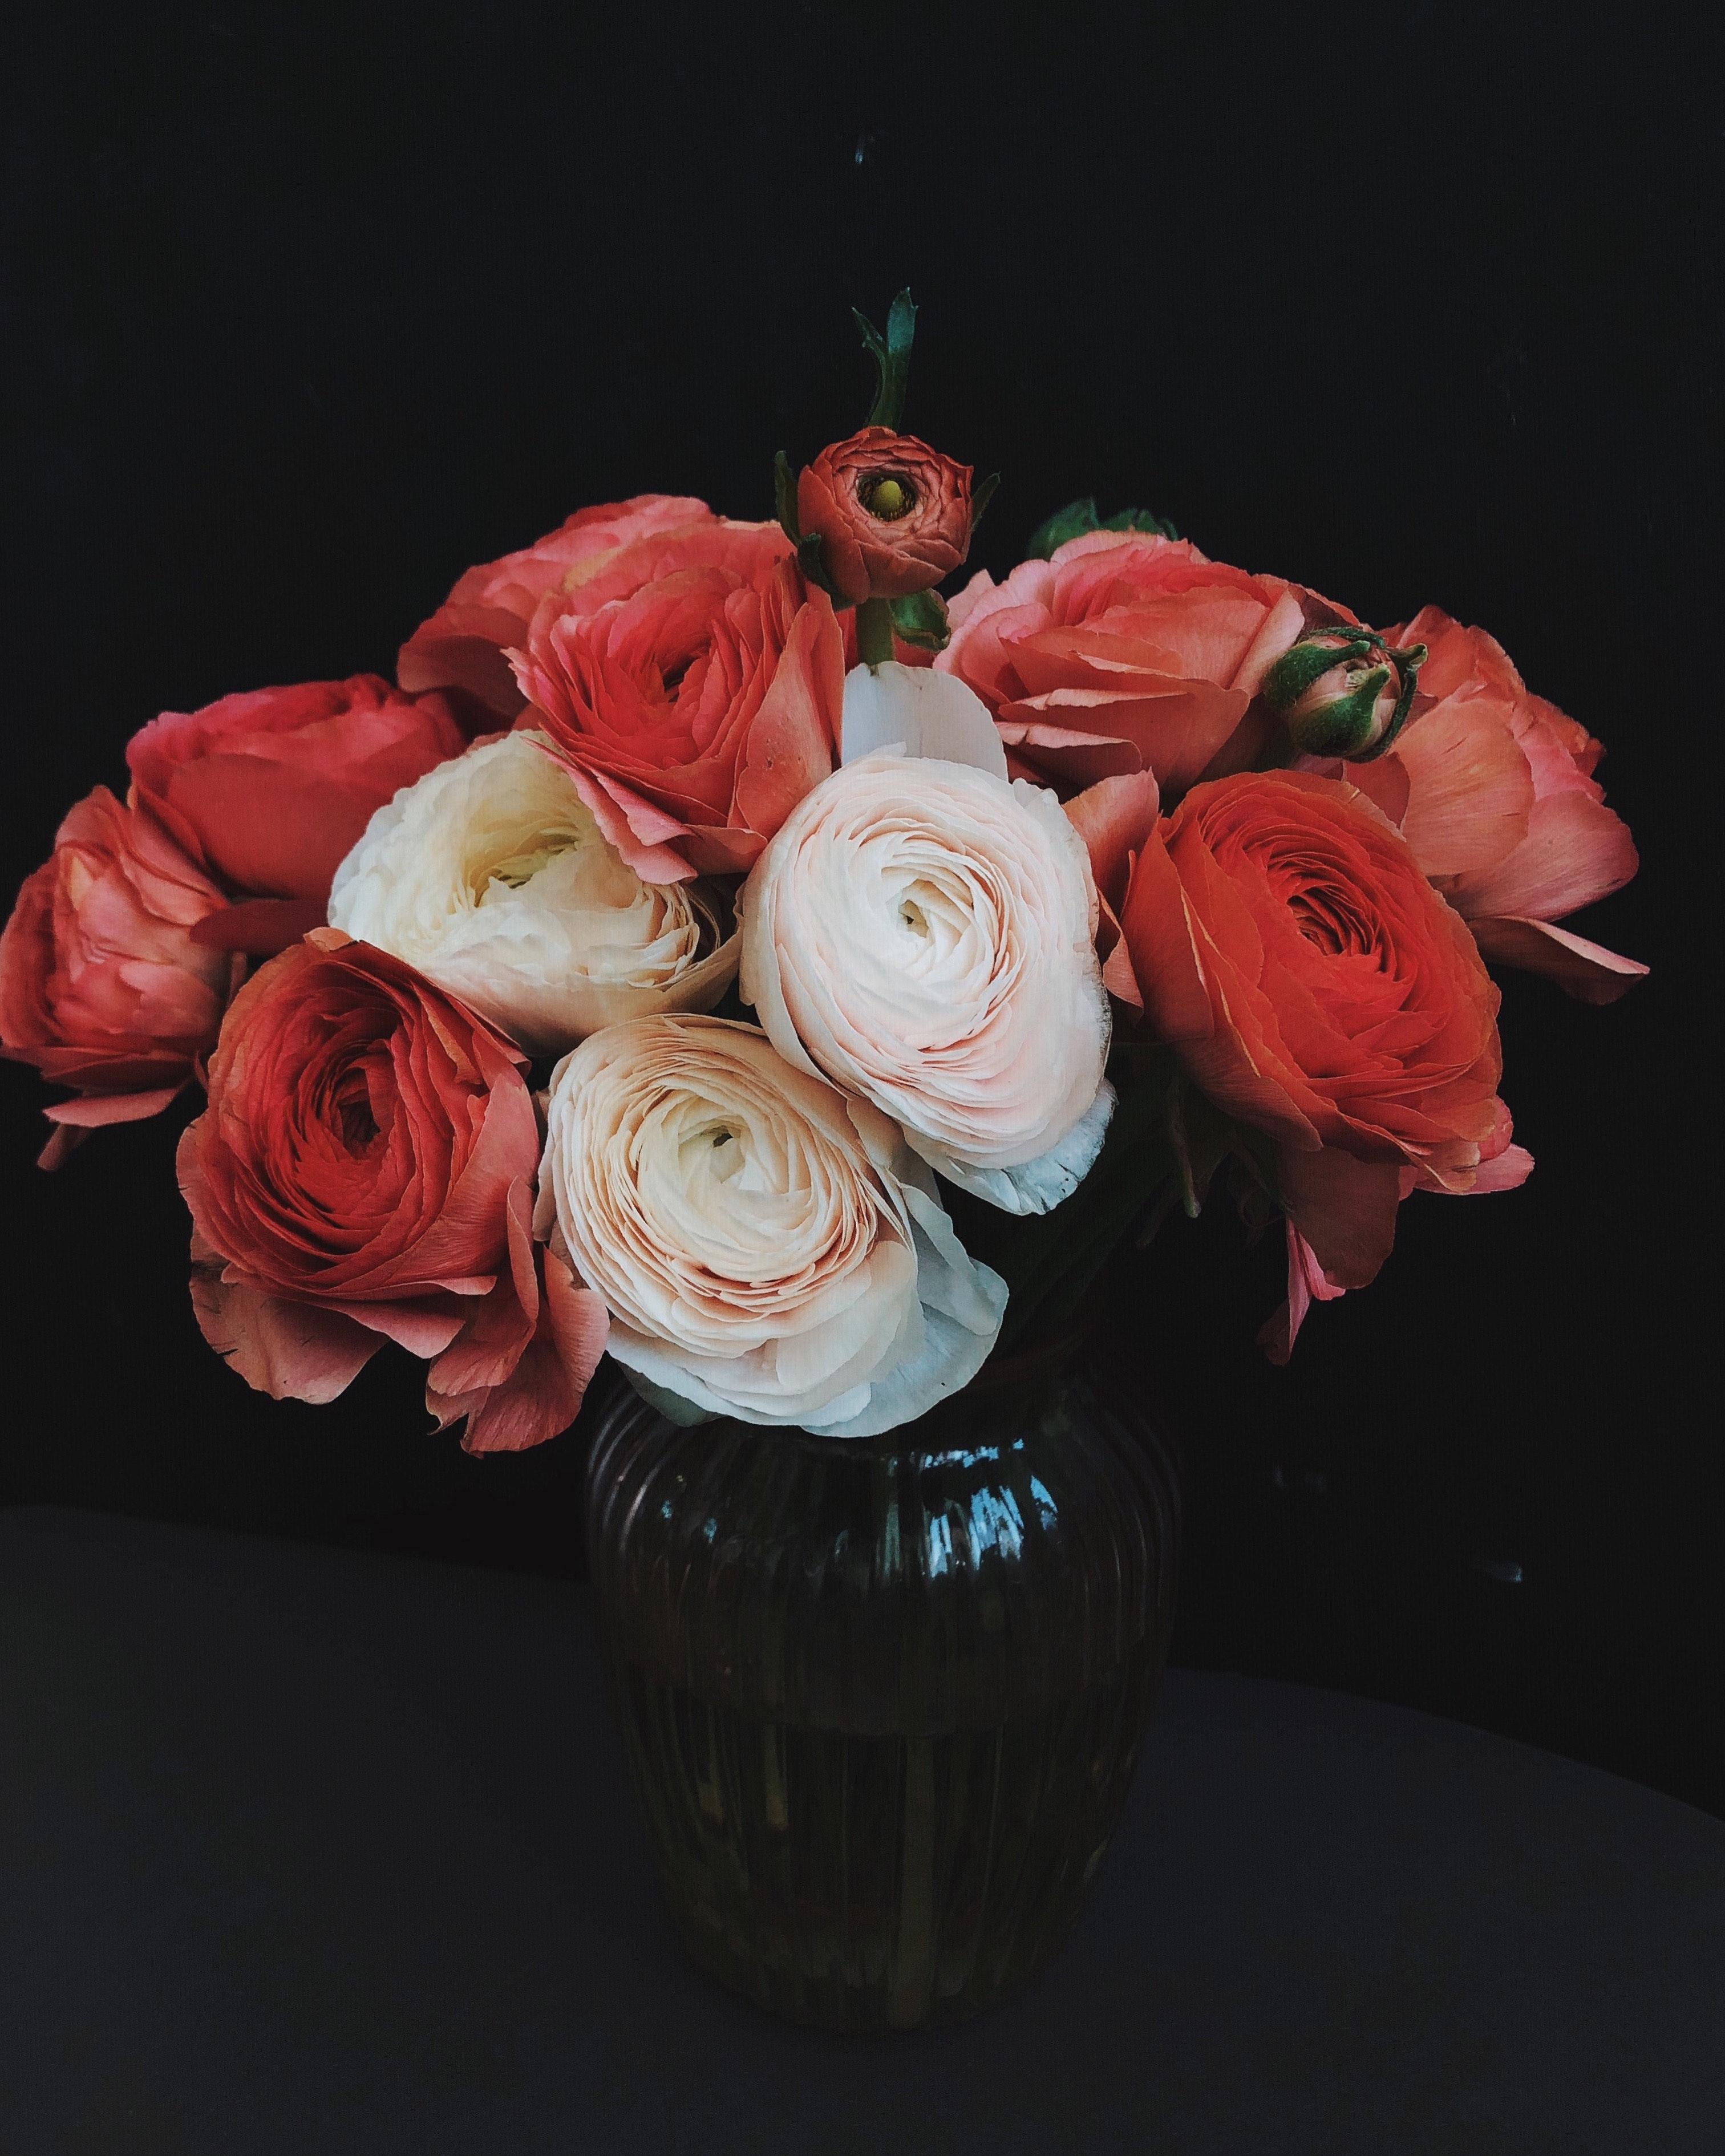 Paling Populer 26+ Gambar Rangkaian Bunga Mawar Hidup ...